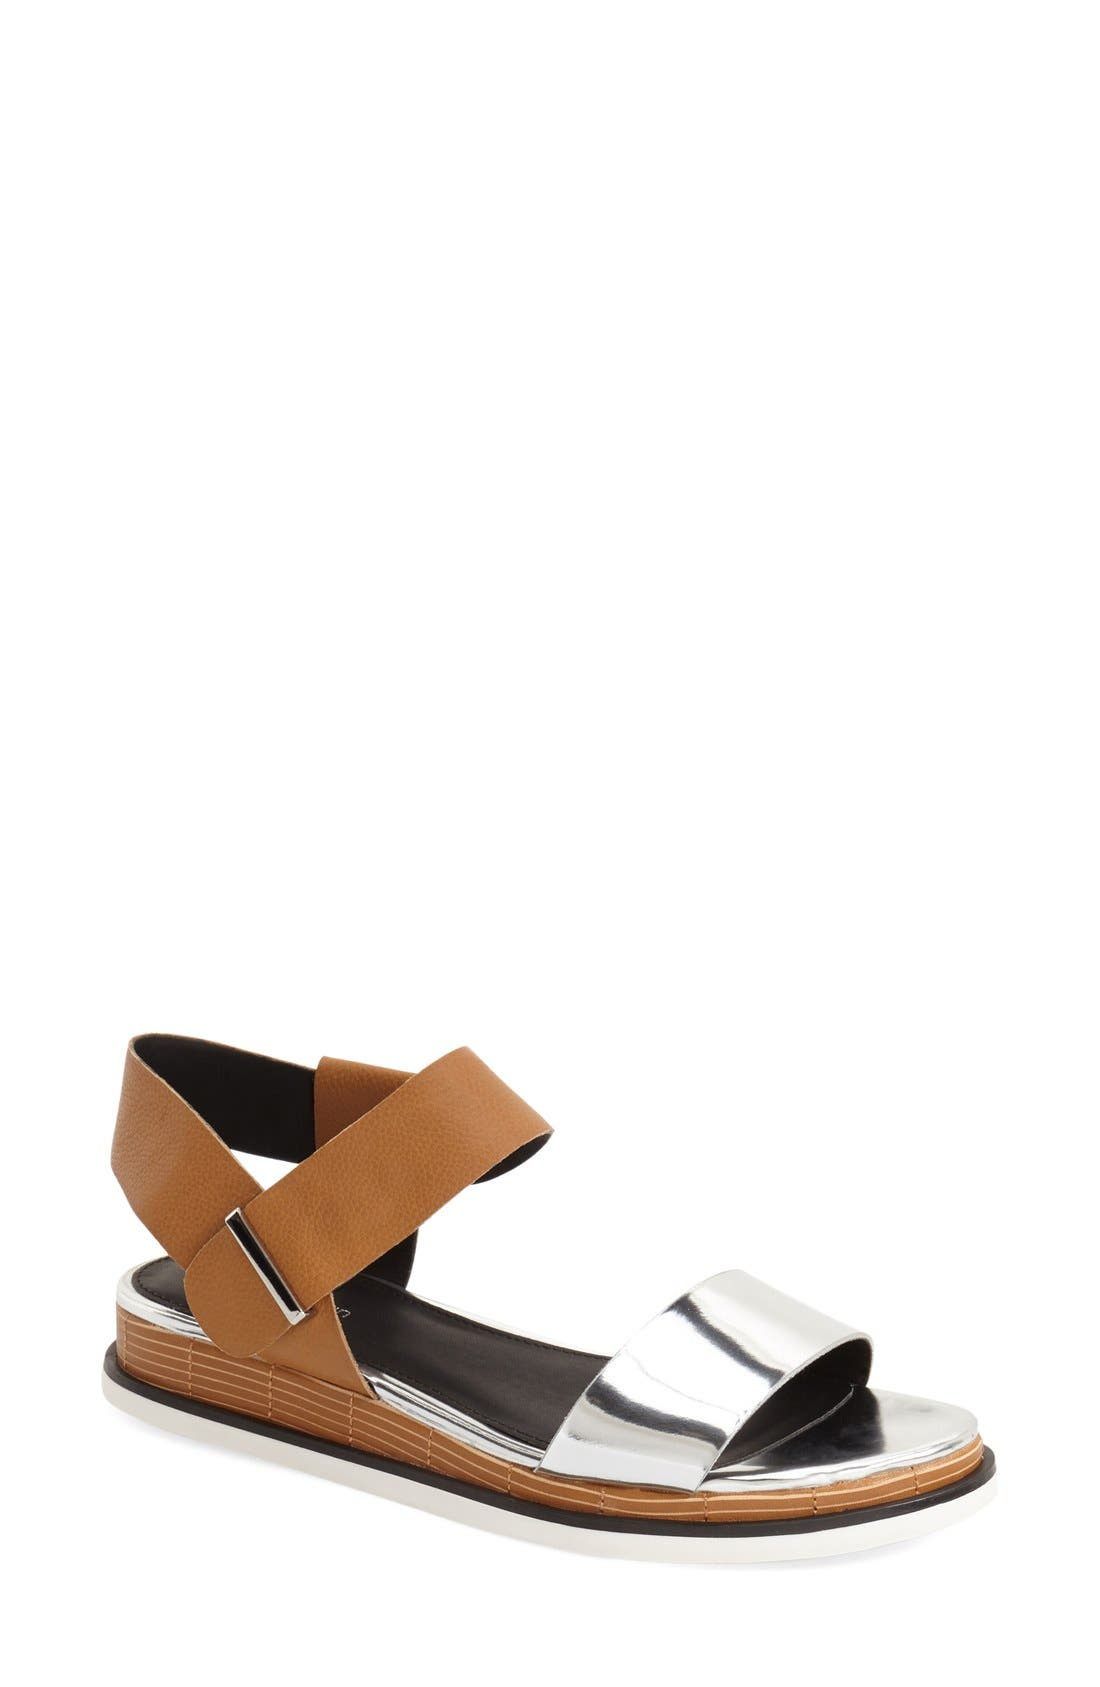 Main Image - Calvin Klein 'Cadan' Demi Wedge Sandal (Women)